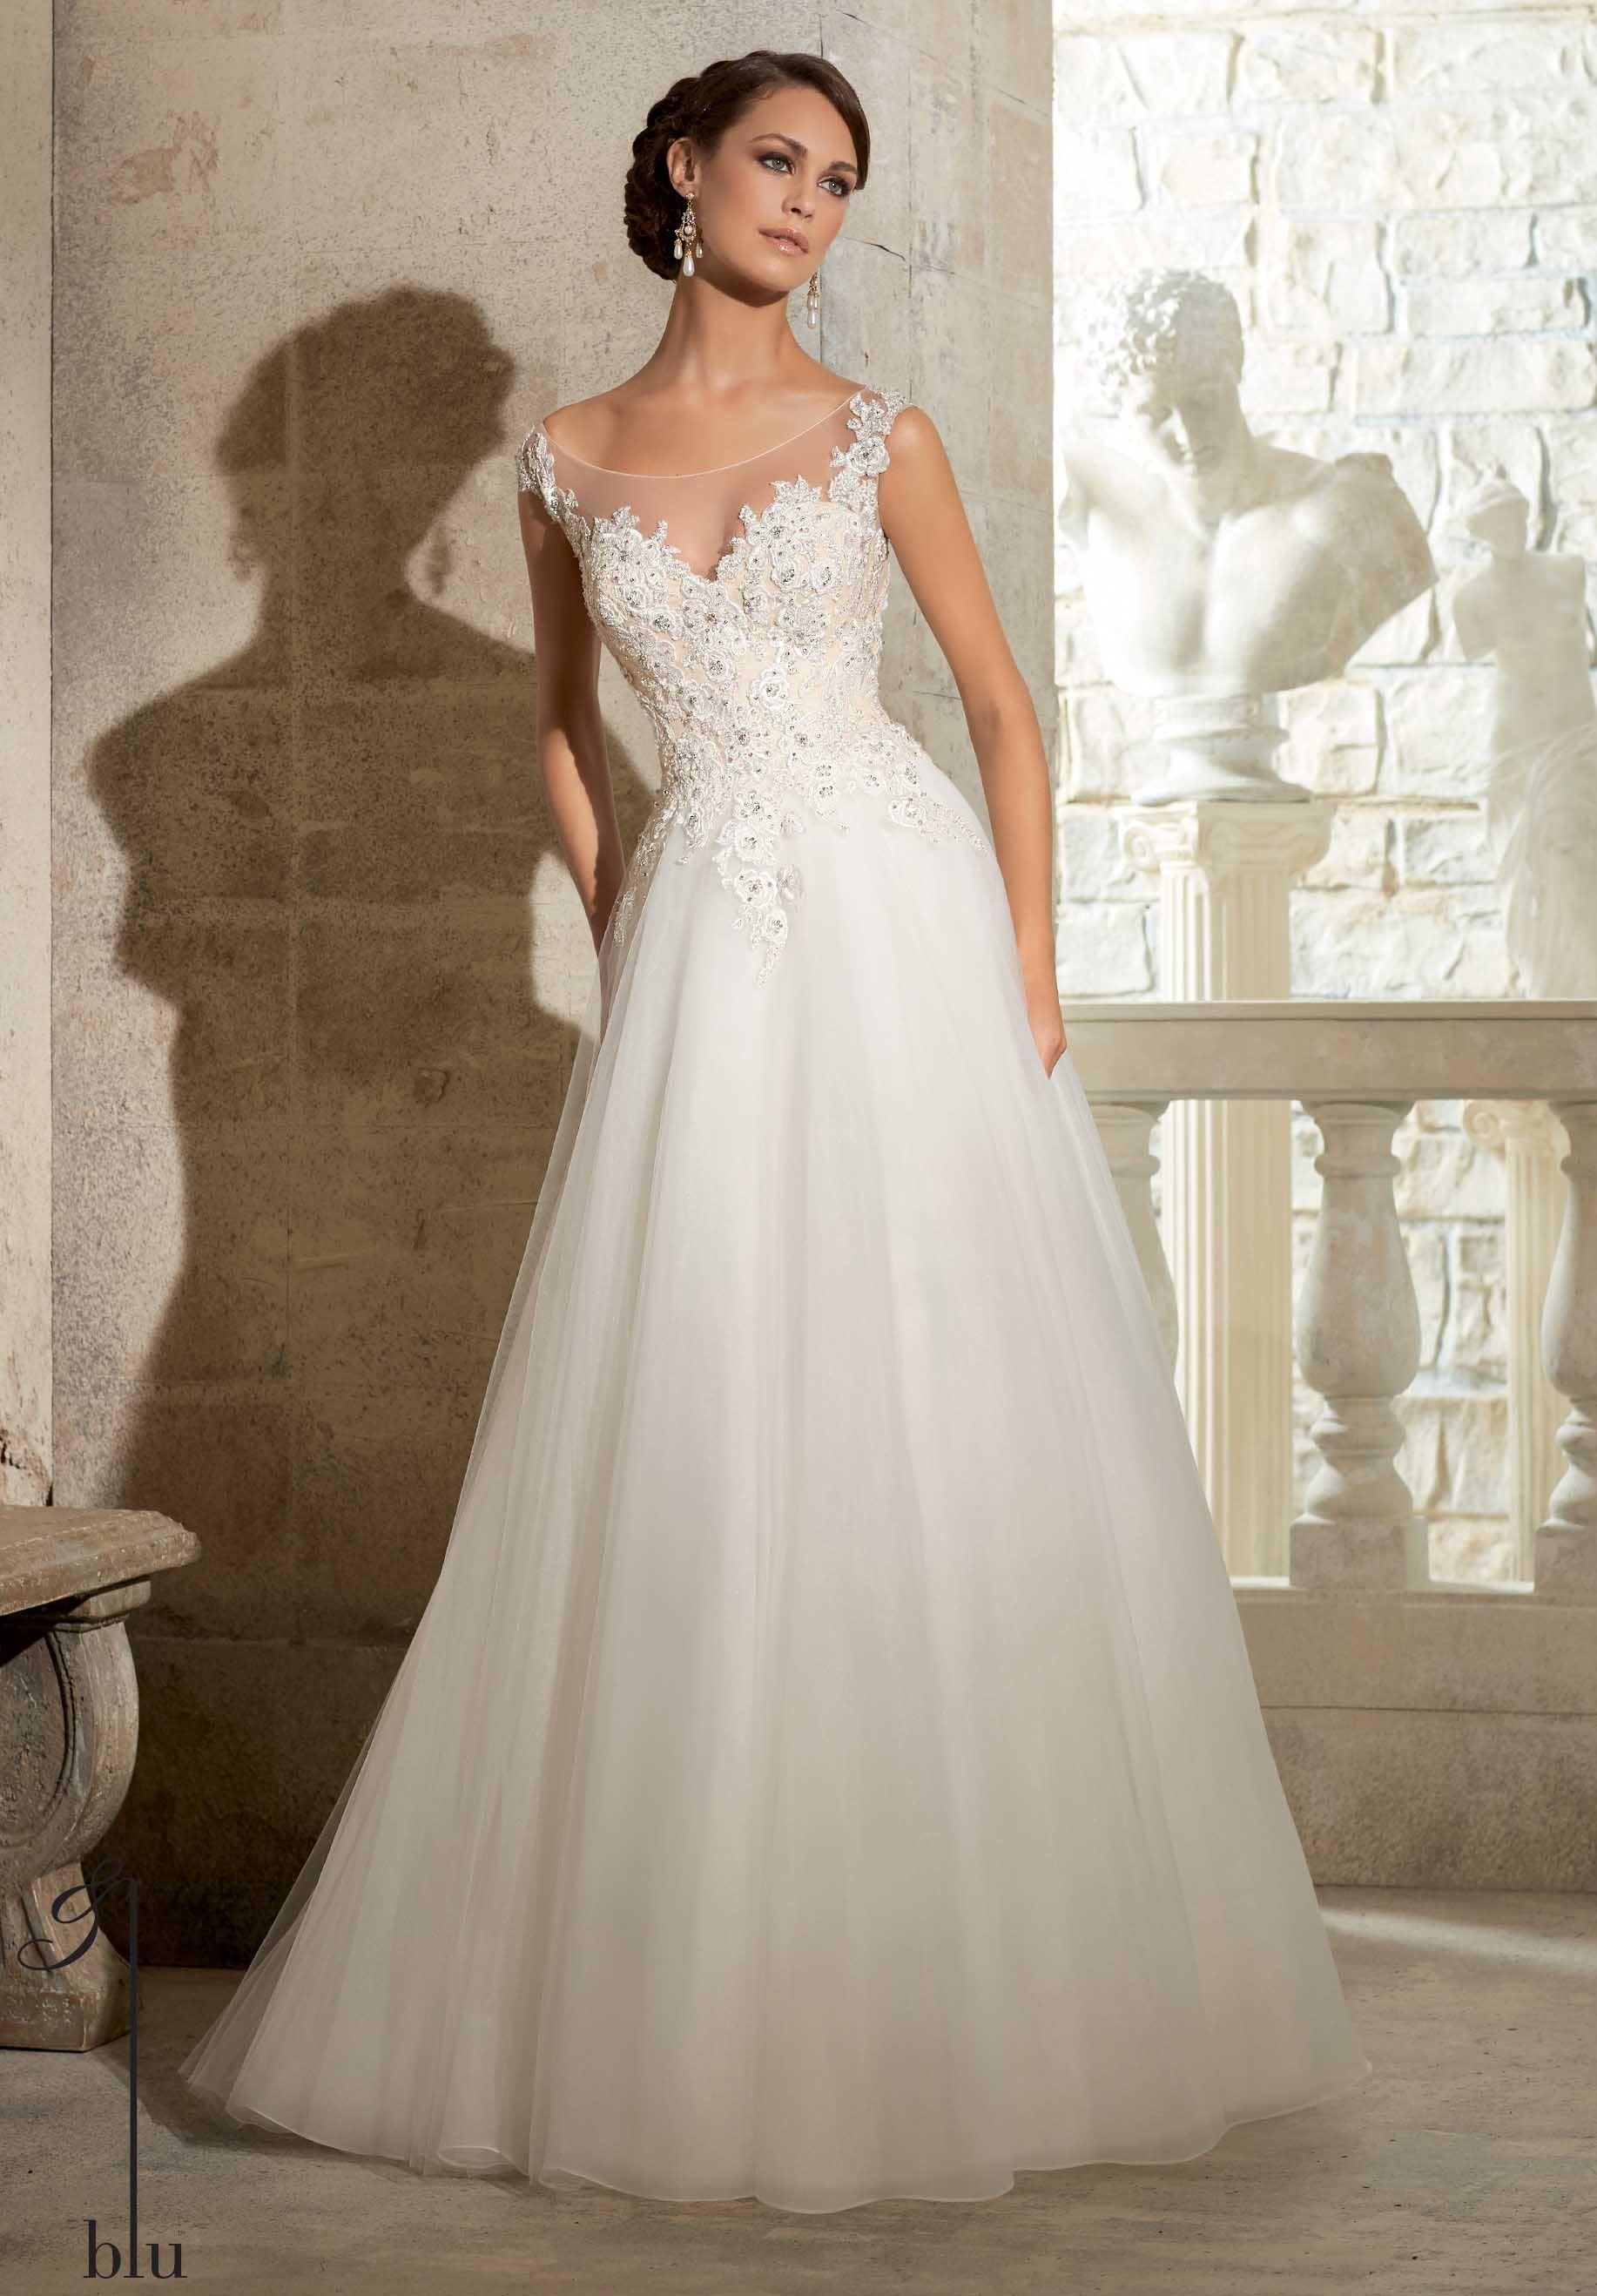 Wedding Dress Www.wedding Dresses 2015 1000 images about wedding dresses on pinterest jasmine bridal allure and bodice